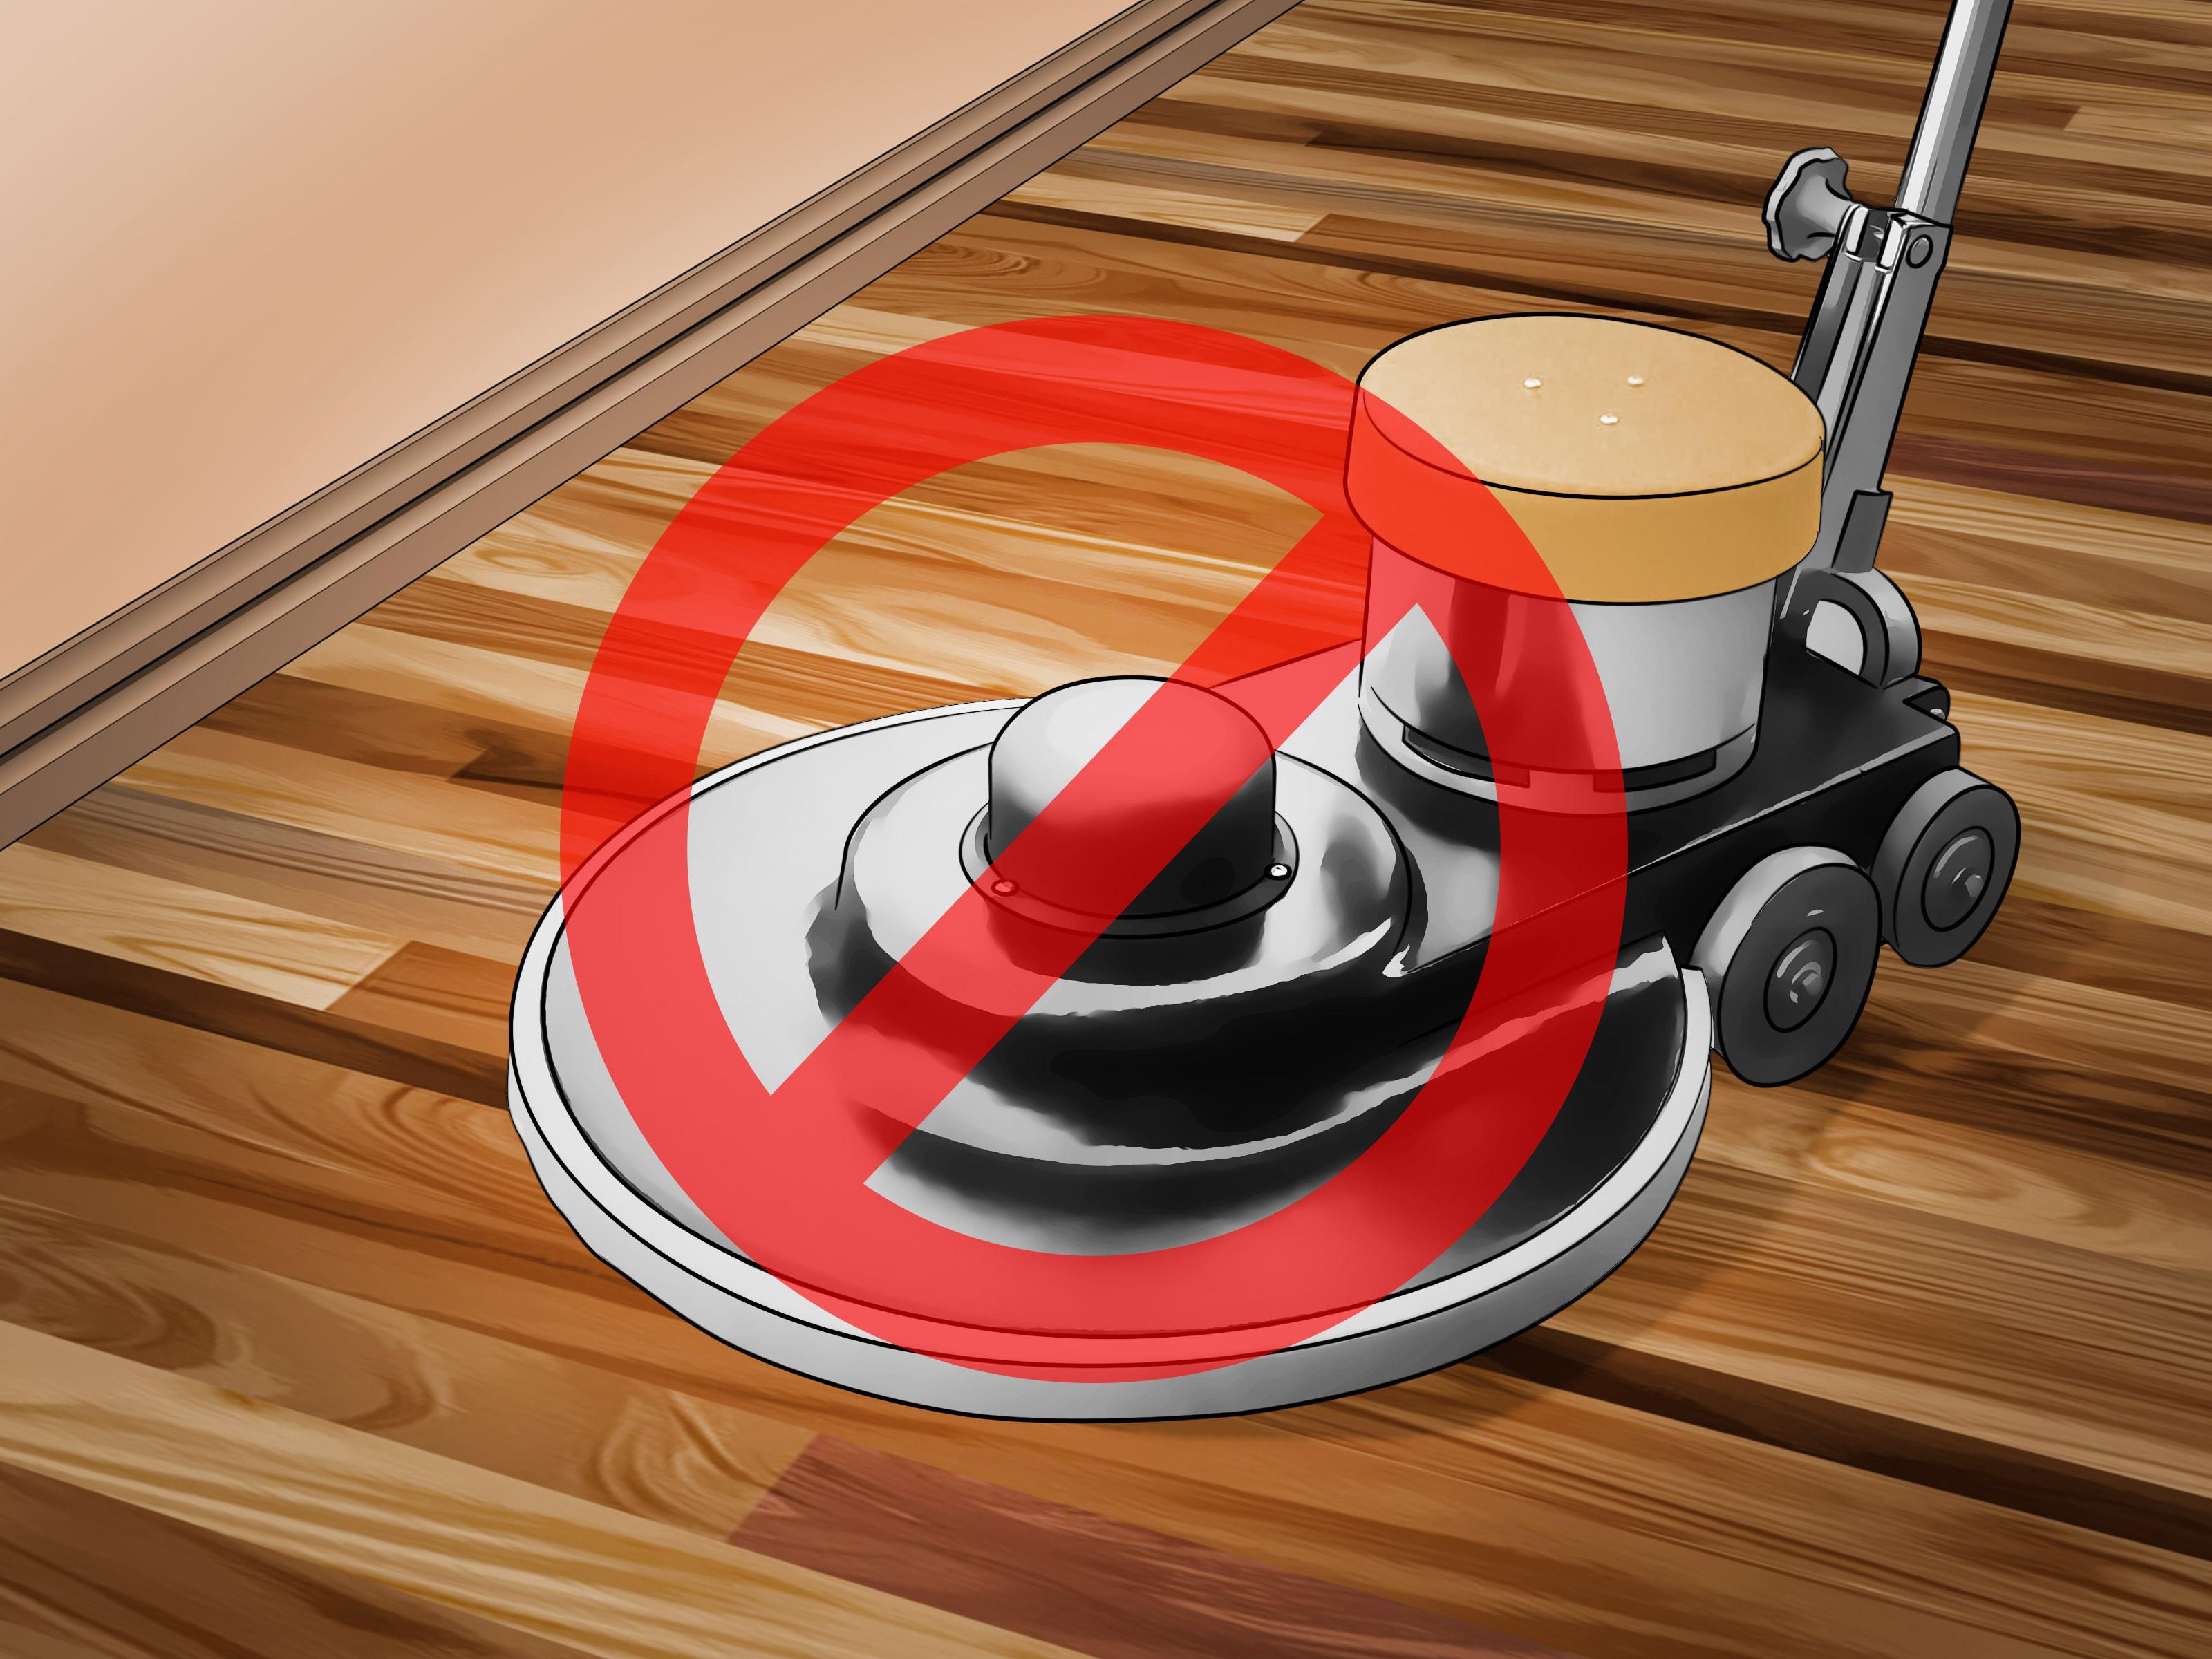 polyurethane drying time hardwood floors of 4 ways to clean polyurethane wood floors wikihow with regard to clean polyurethane wood floors step 15